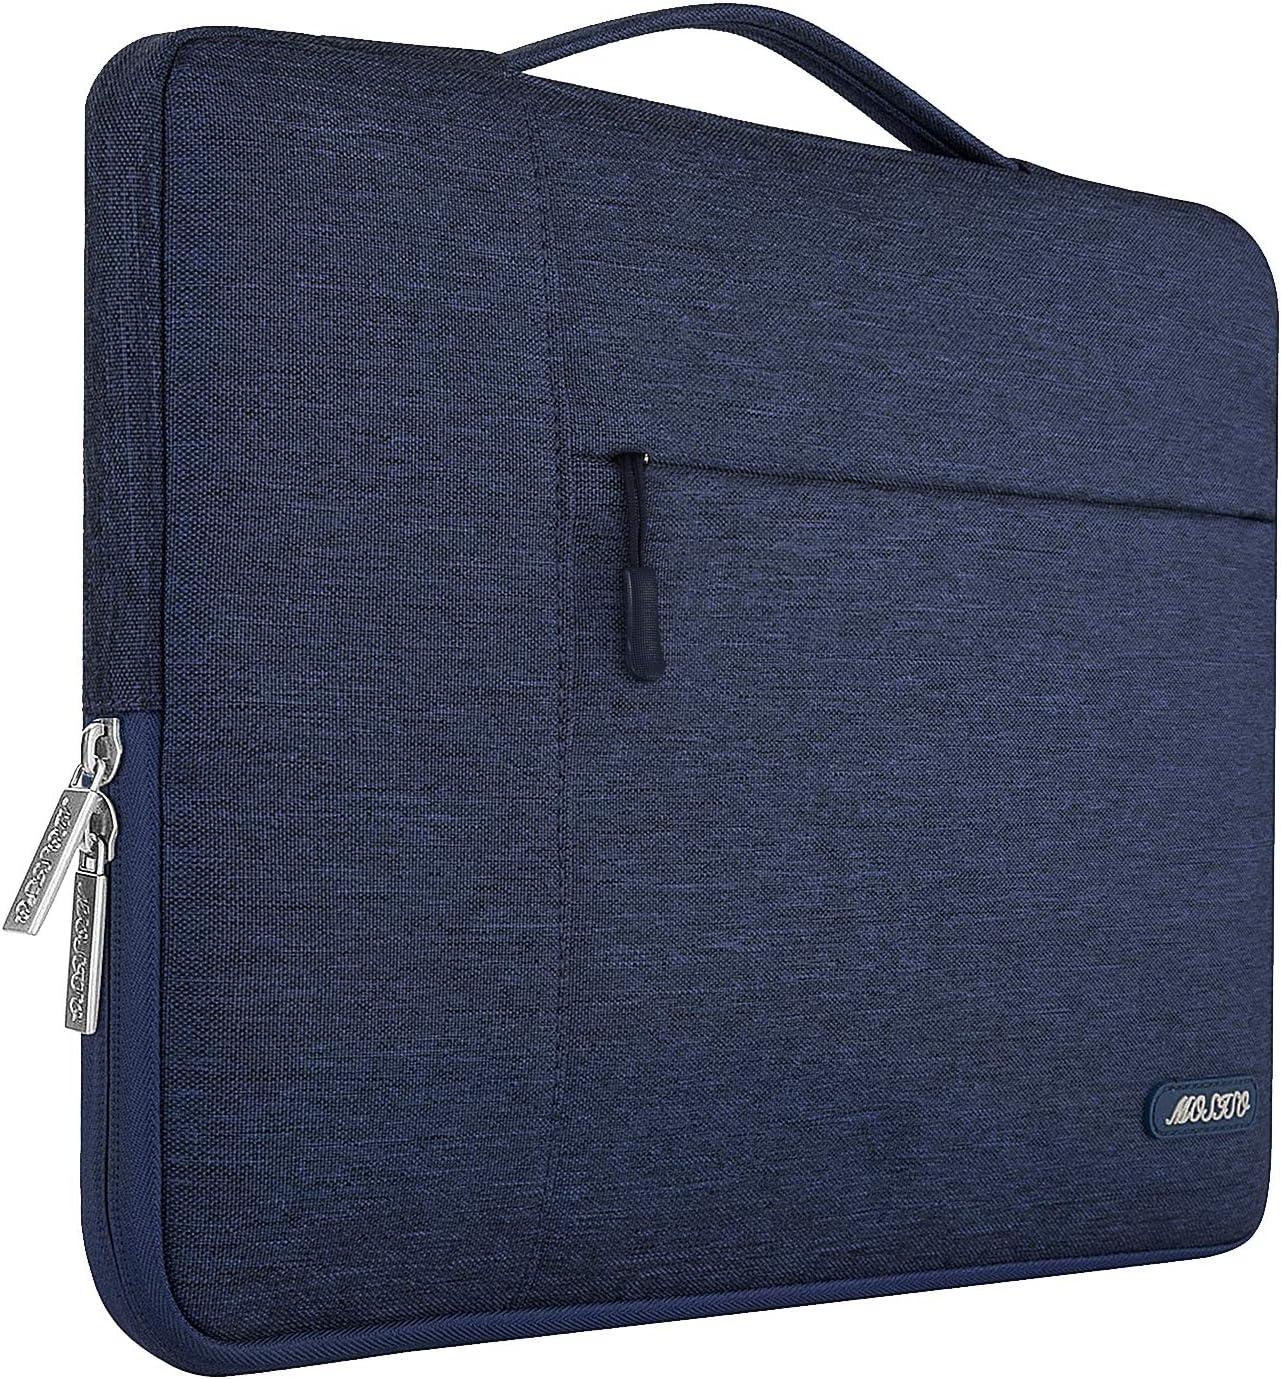 MOSISO Funda Blanda Compatible con 13-13,3 Pulgadas MacBook Air/MacBook Pro Retina/2019 Surface Laptop 3/Surface Book 2, Poliéster Maletín Protectora Multifuncional Bolso, Azul Marino